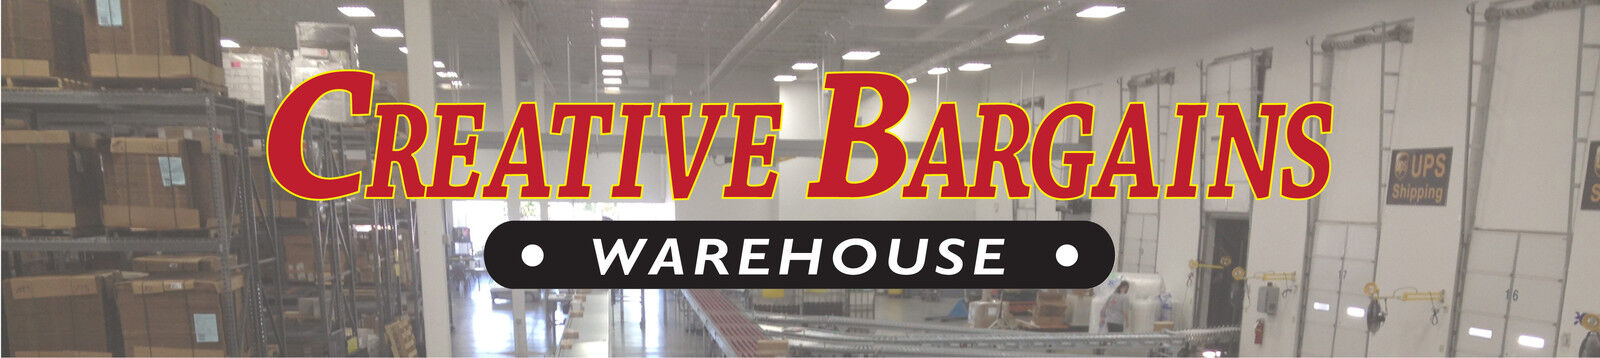 Creative Bargains Warehouse